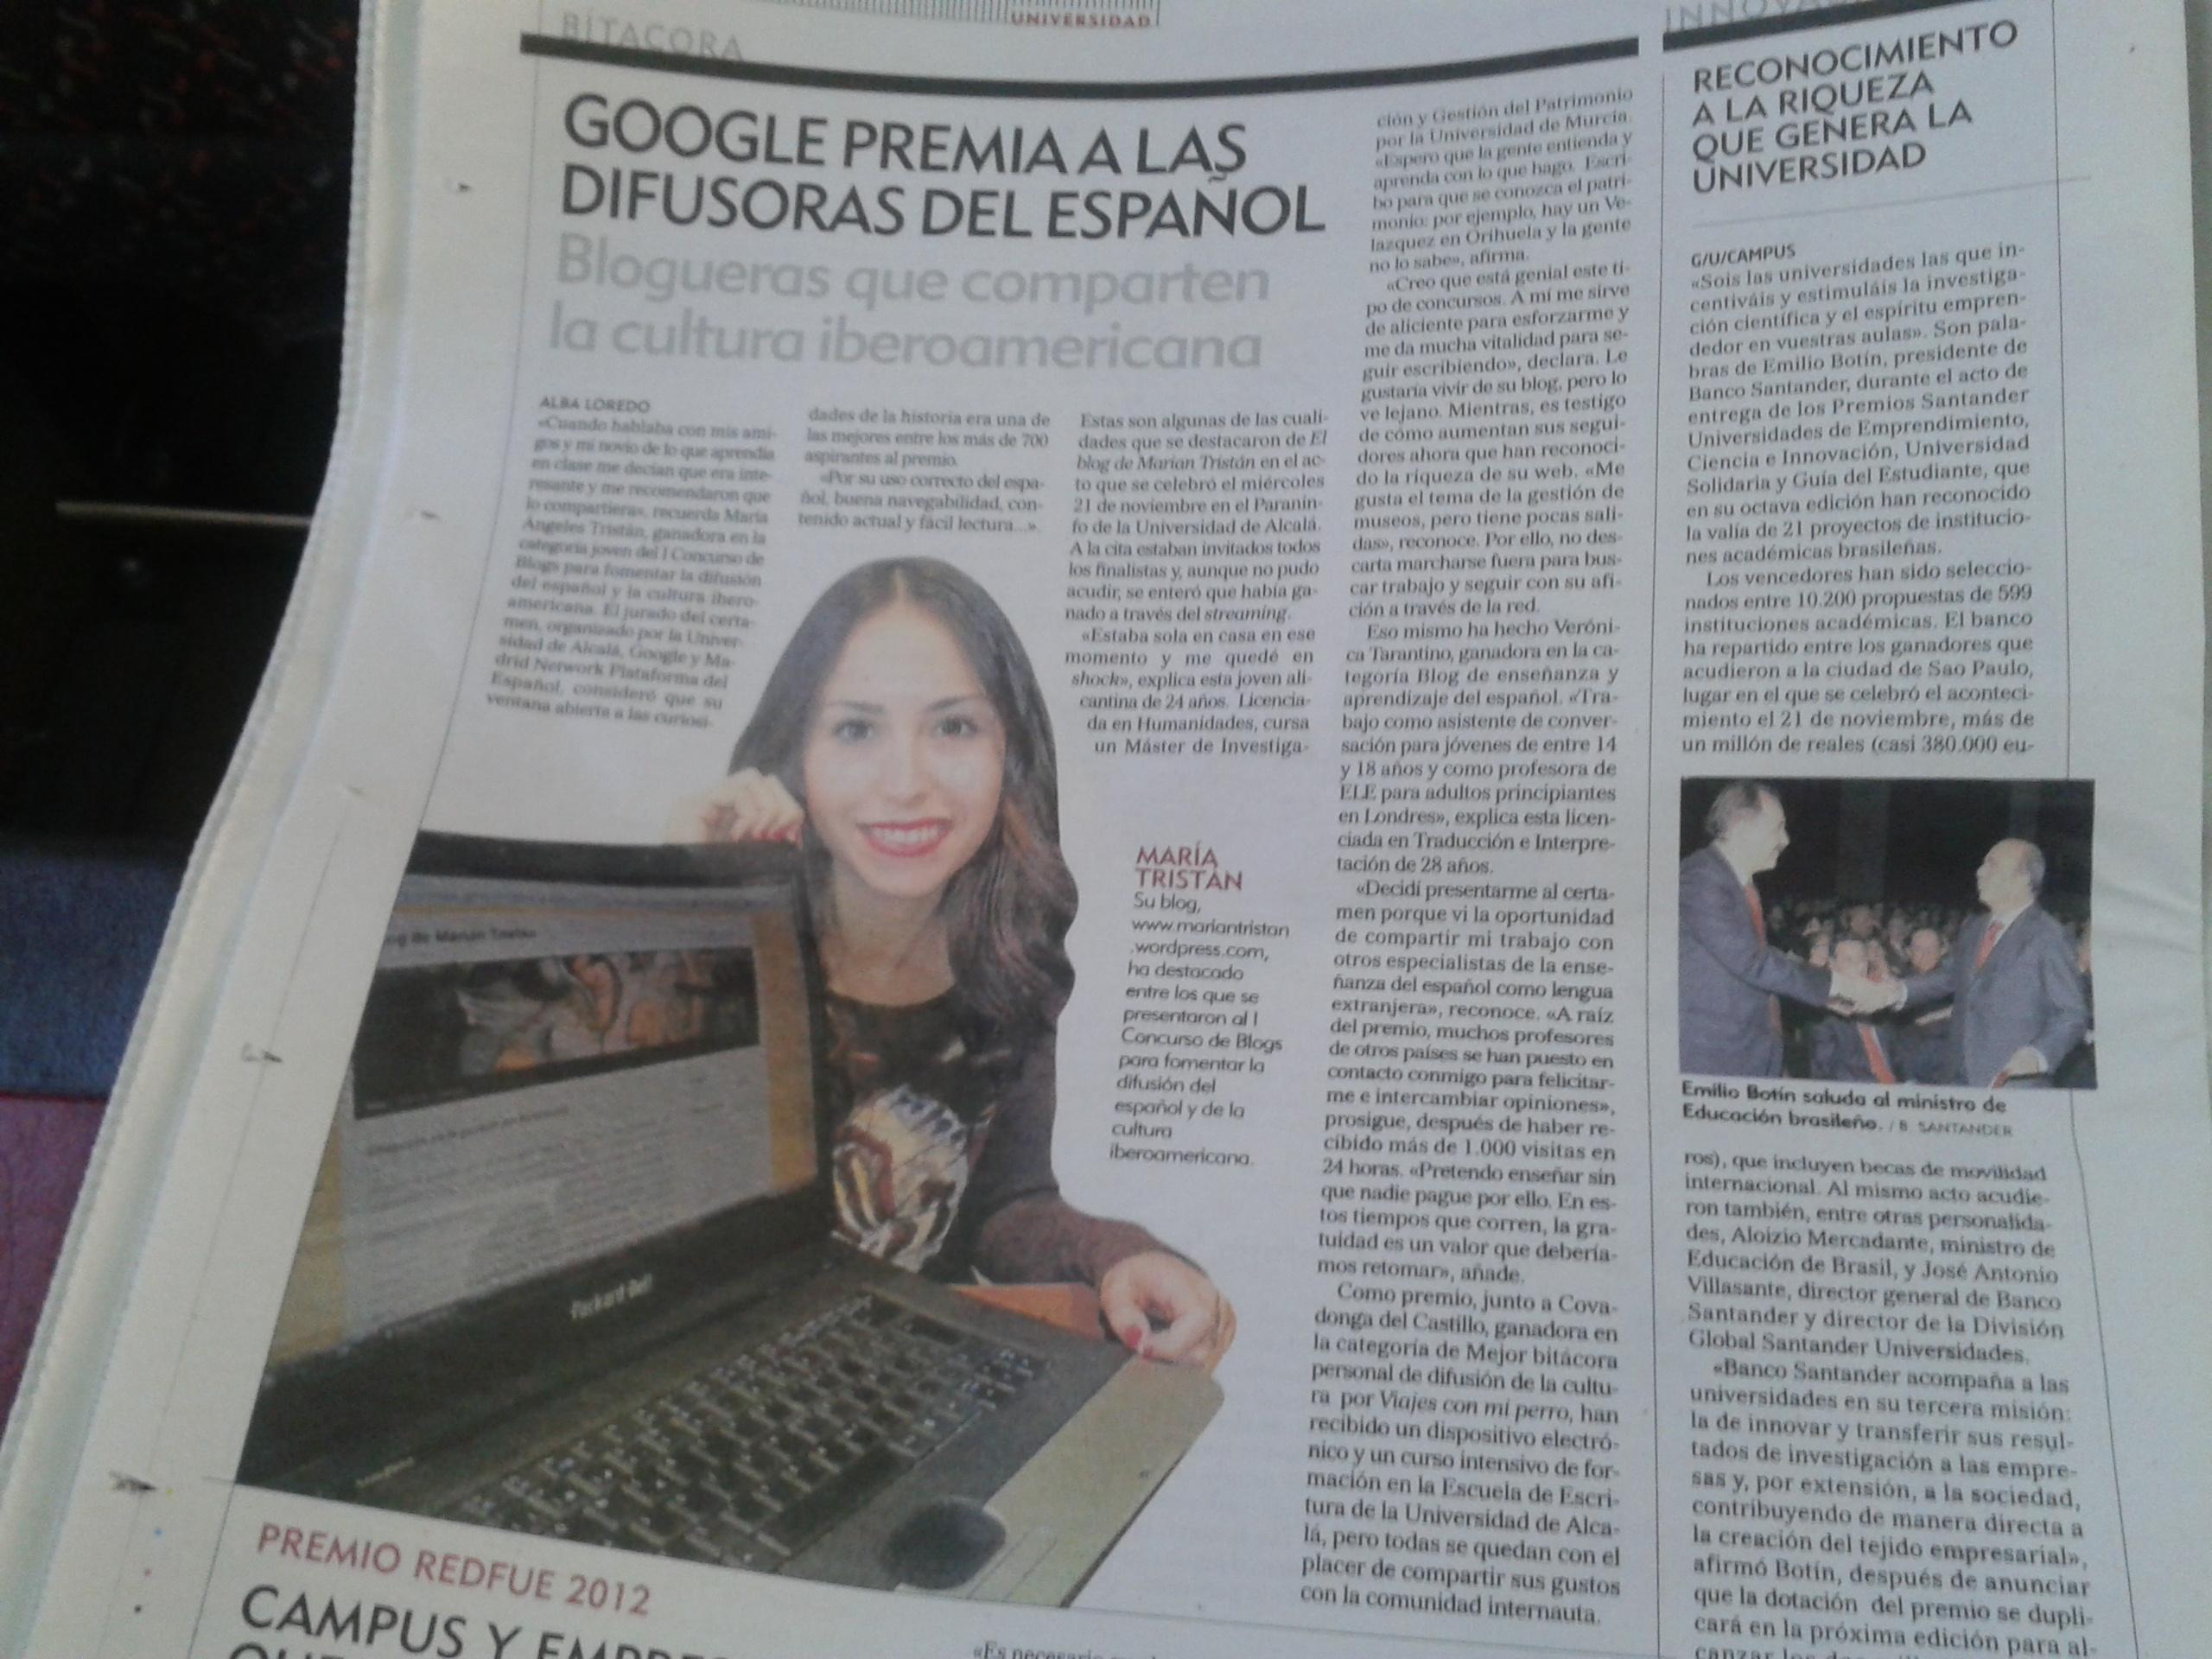 Marian Tristán, la mejor bloguera joven según Google